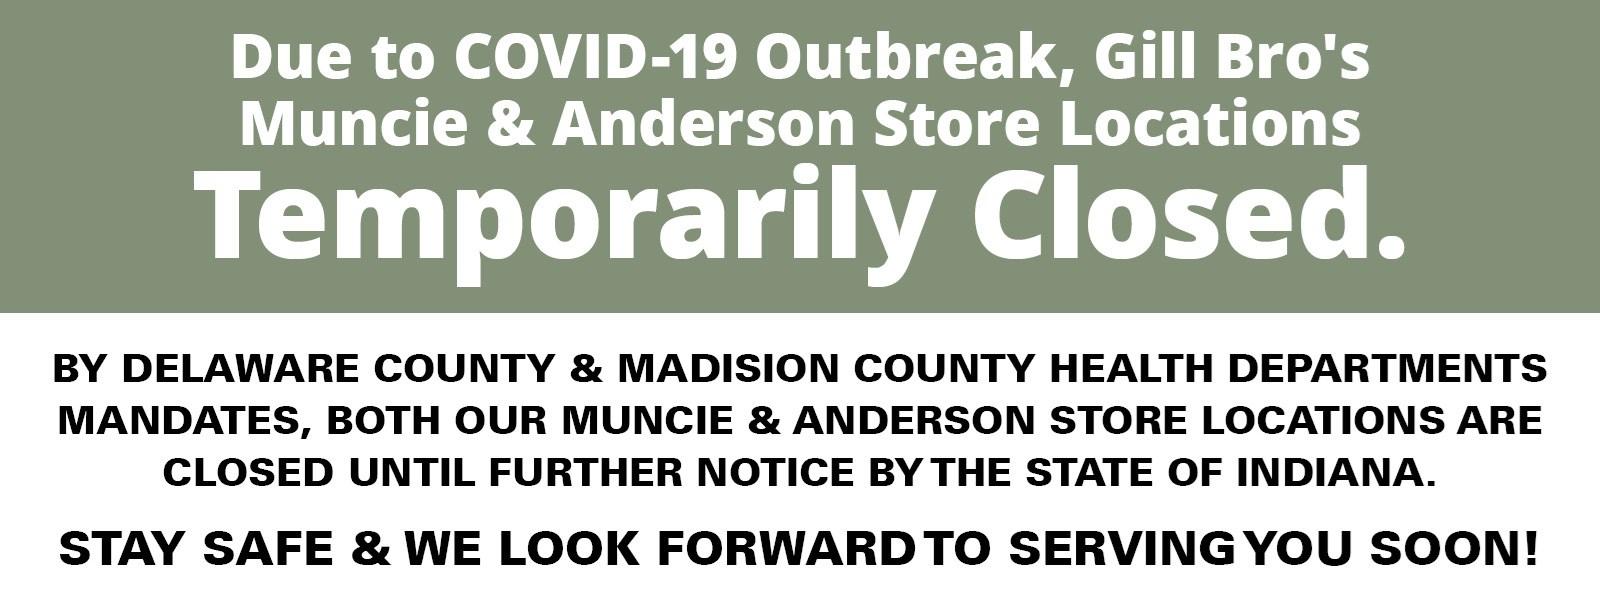 Stores Closed Indefinitely